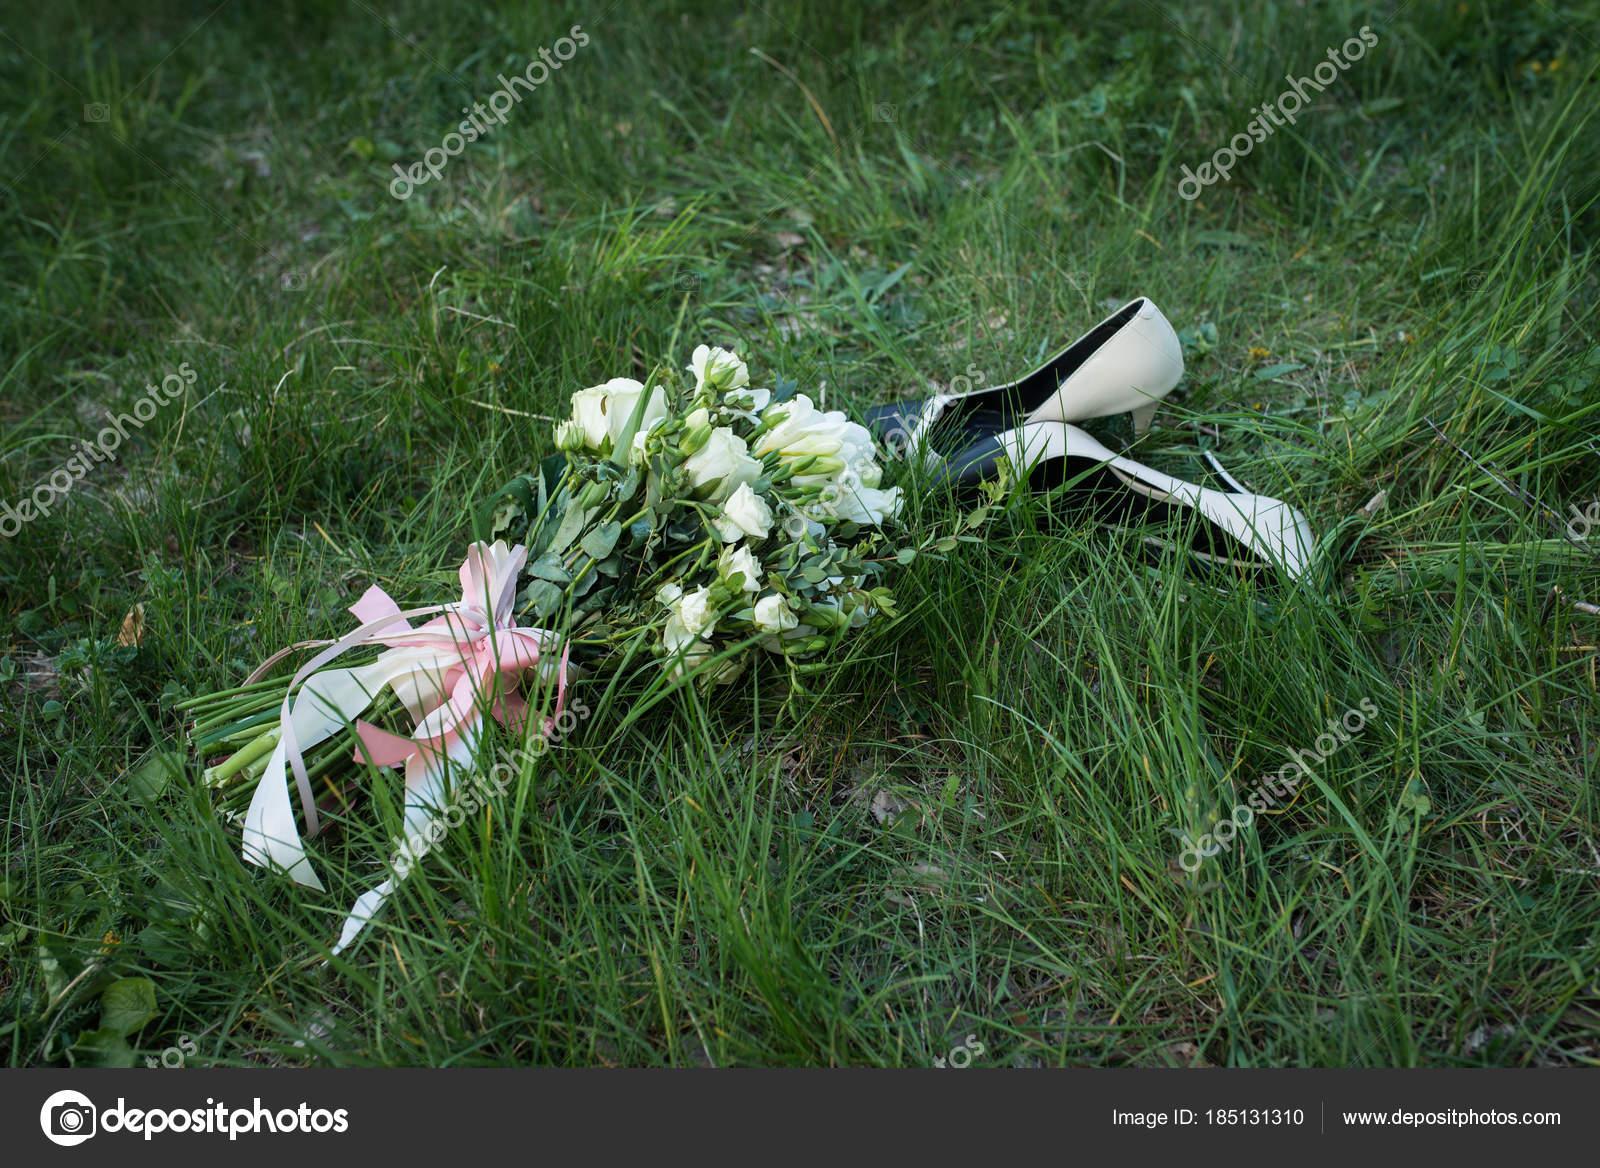 733119c9e18e Γαμήλια ανθοδέσμη. Γυναικεία μόδα παπούτσια μπεζ και μαύρο γάμου με  μπουκέτο νύφης